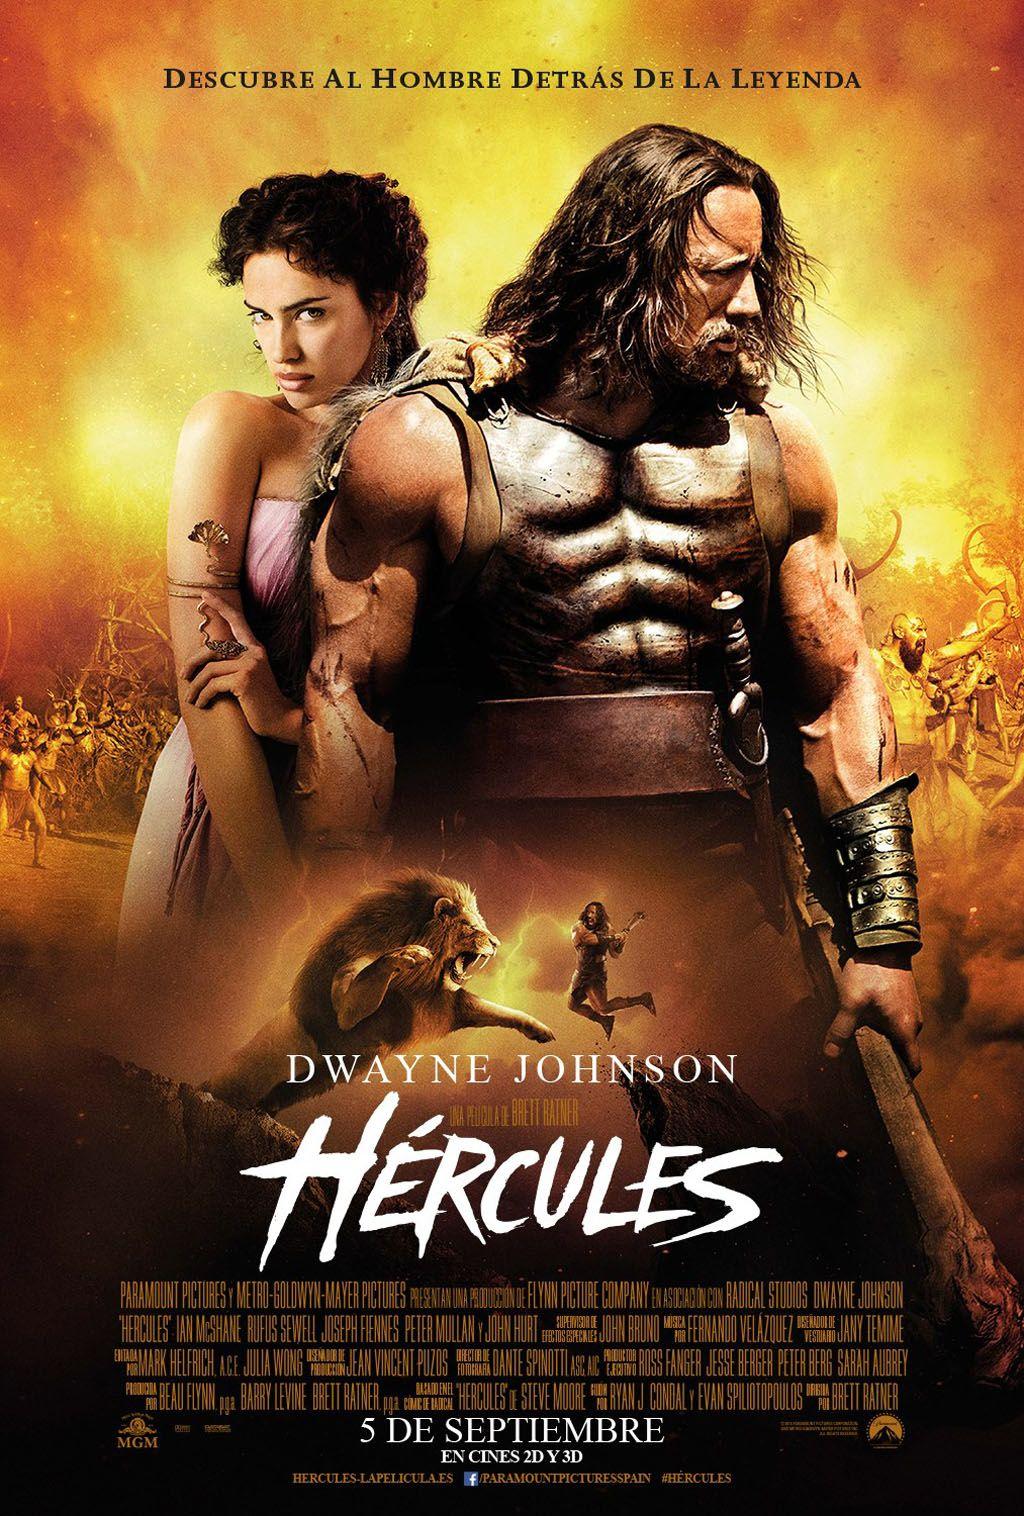 Hercules 2014 Filme Kostenlos Online Herkules Hd Filme